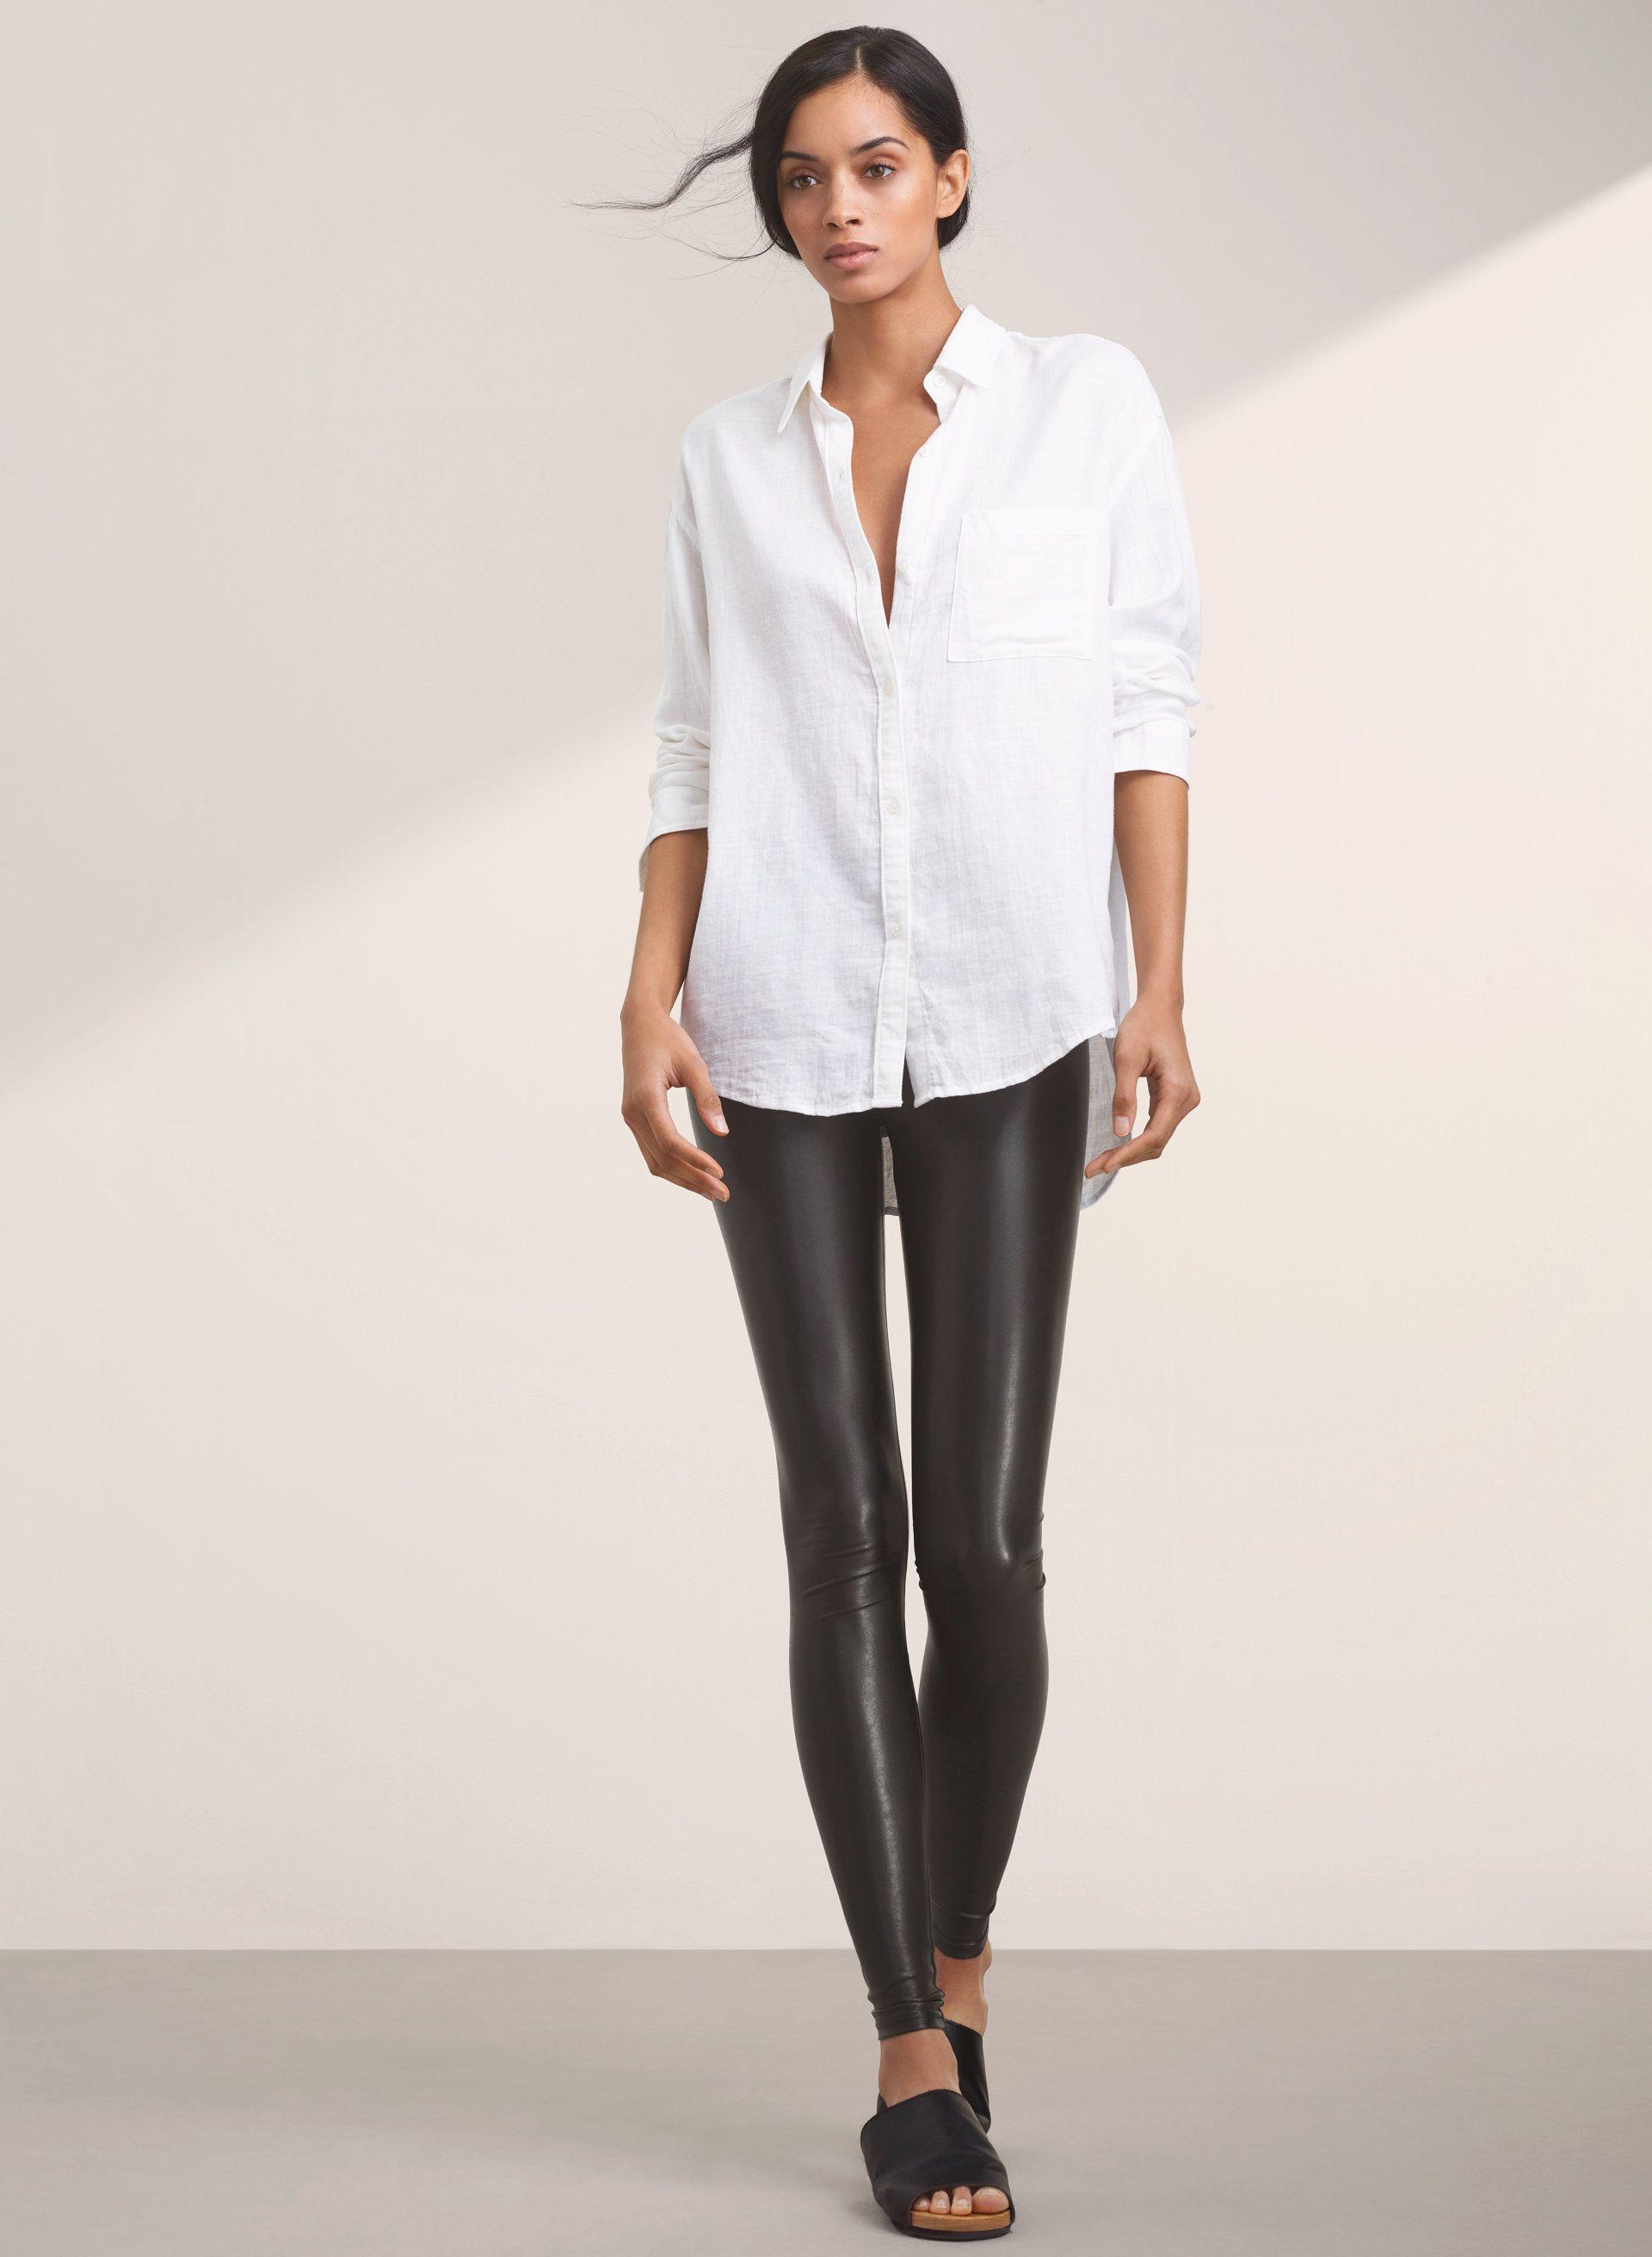 c6b9b0fe76563 Daria pant | F A S H I O N | Pants, Leather pants outfit, Fashion